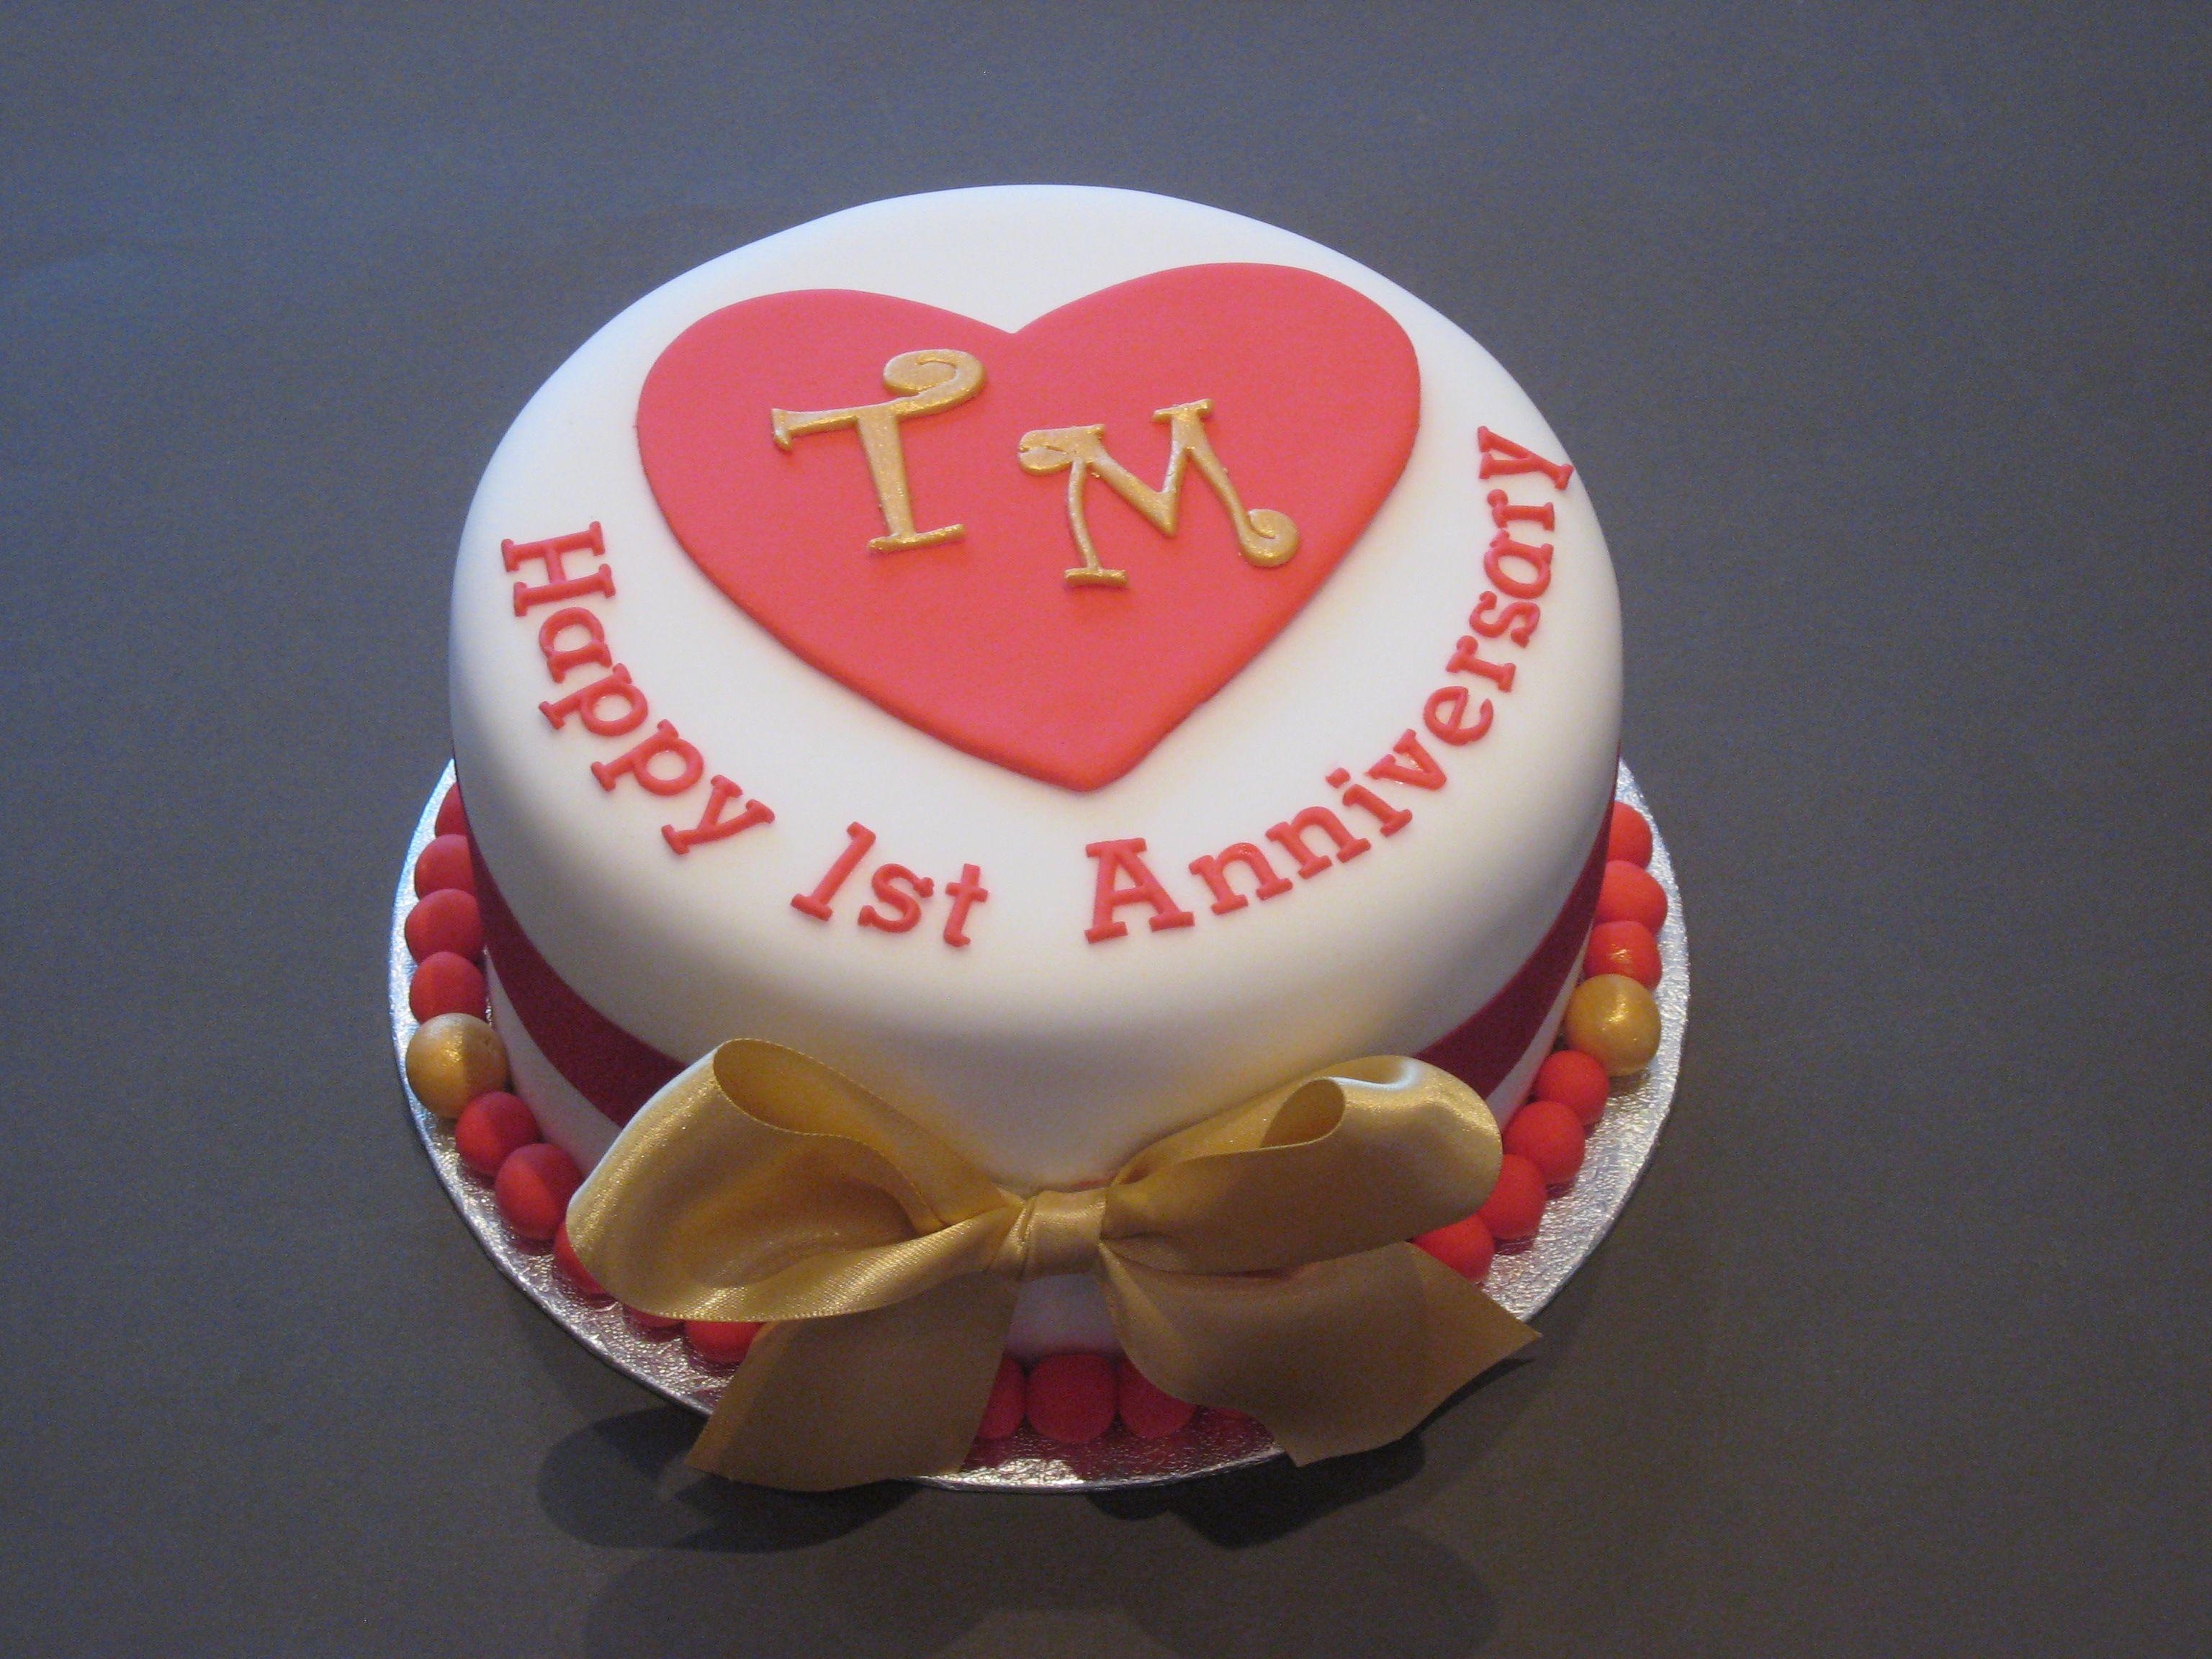 1st Anniversary Cake - http://drfriedlanderdvm.com/1st ...